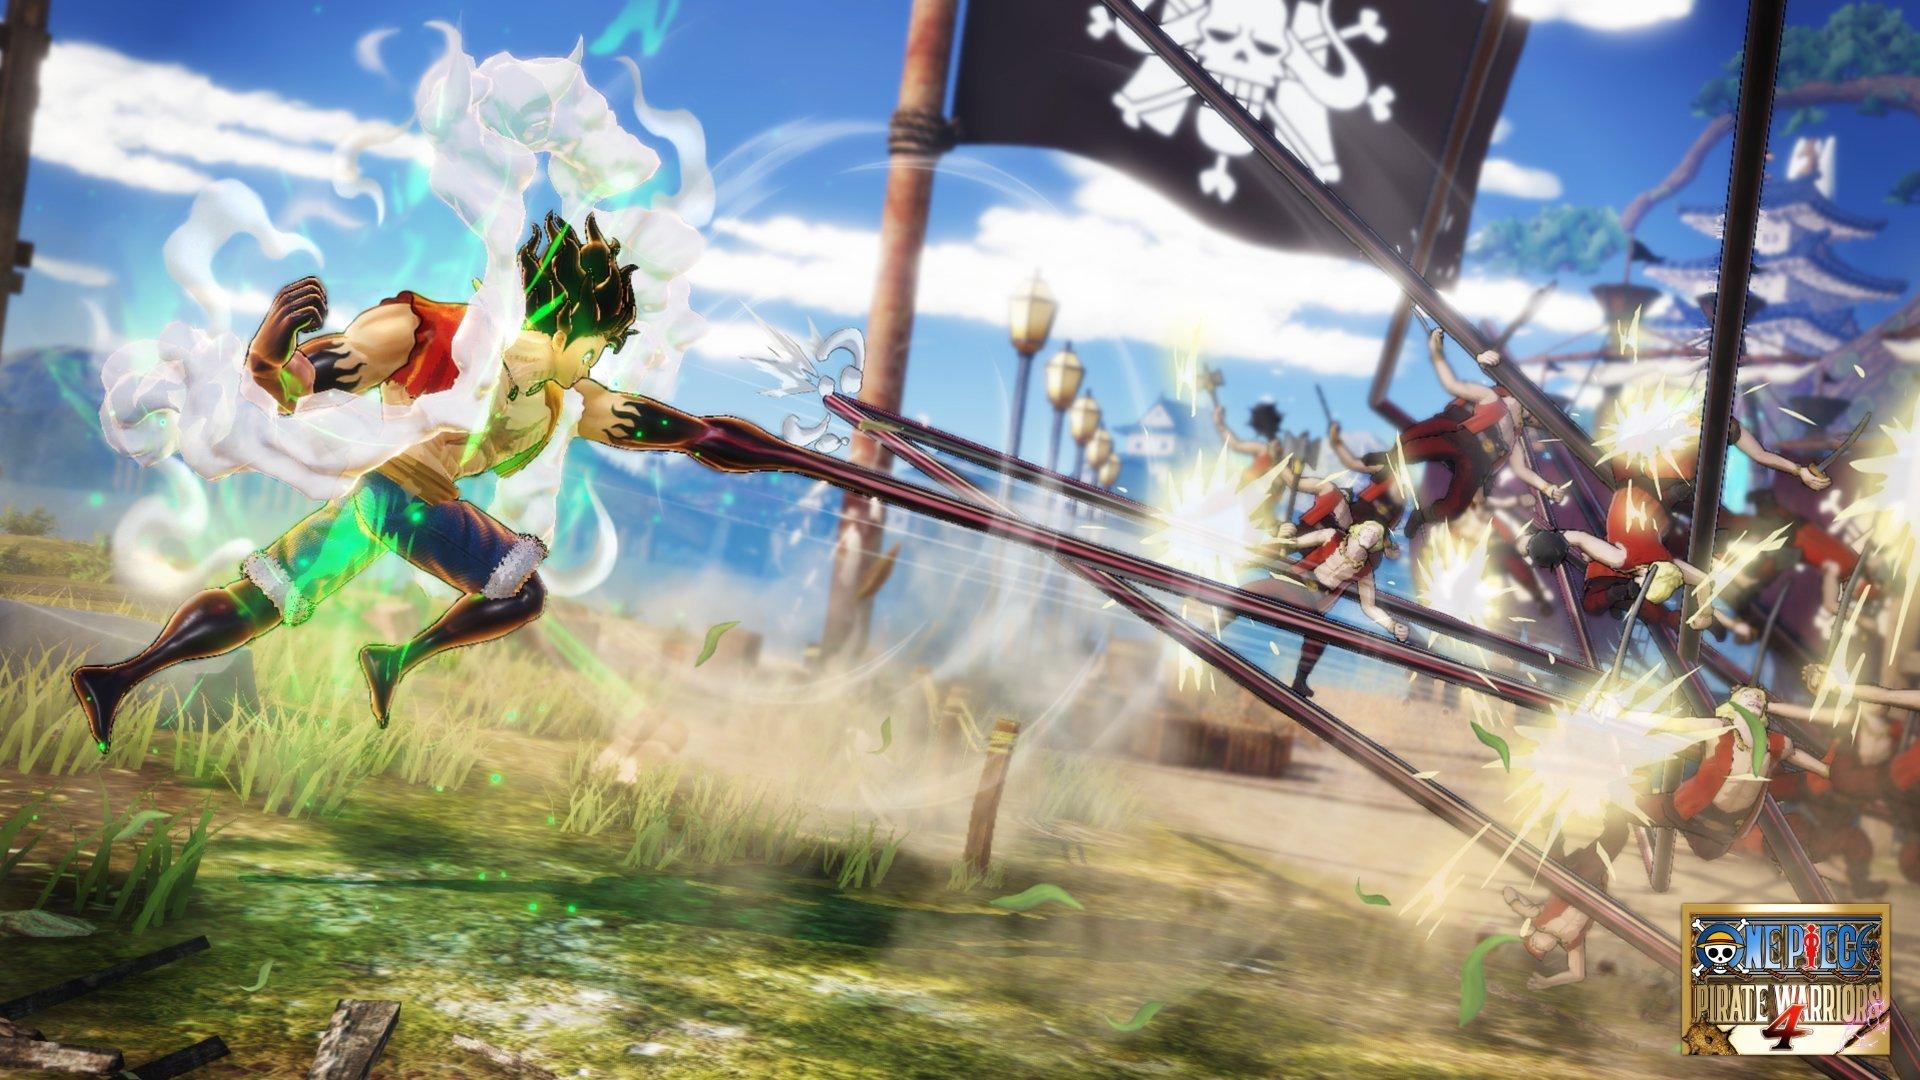 Kekalahan luffy yang paling menyakitkan adalah ketika ia harus menghadapi temannya sendiri! How To Unlock All Characters In One Piece Pirate Warriors 4 Gamepur